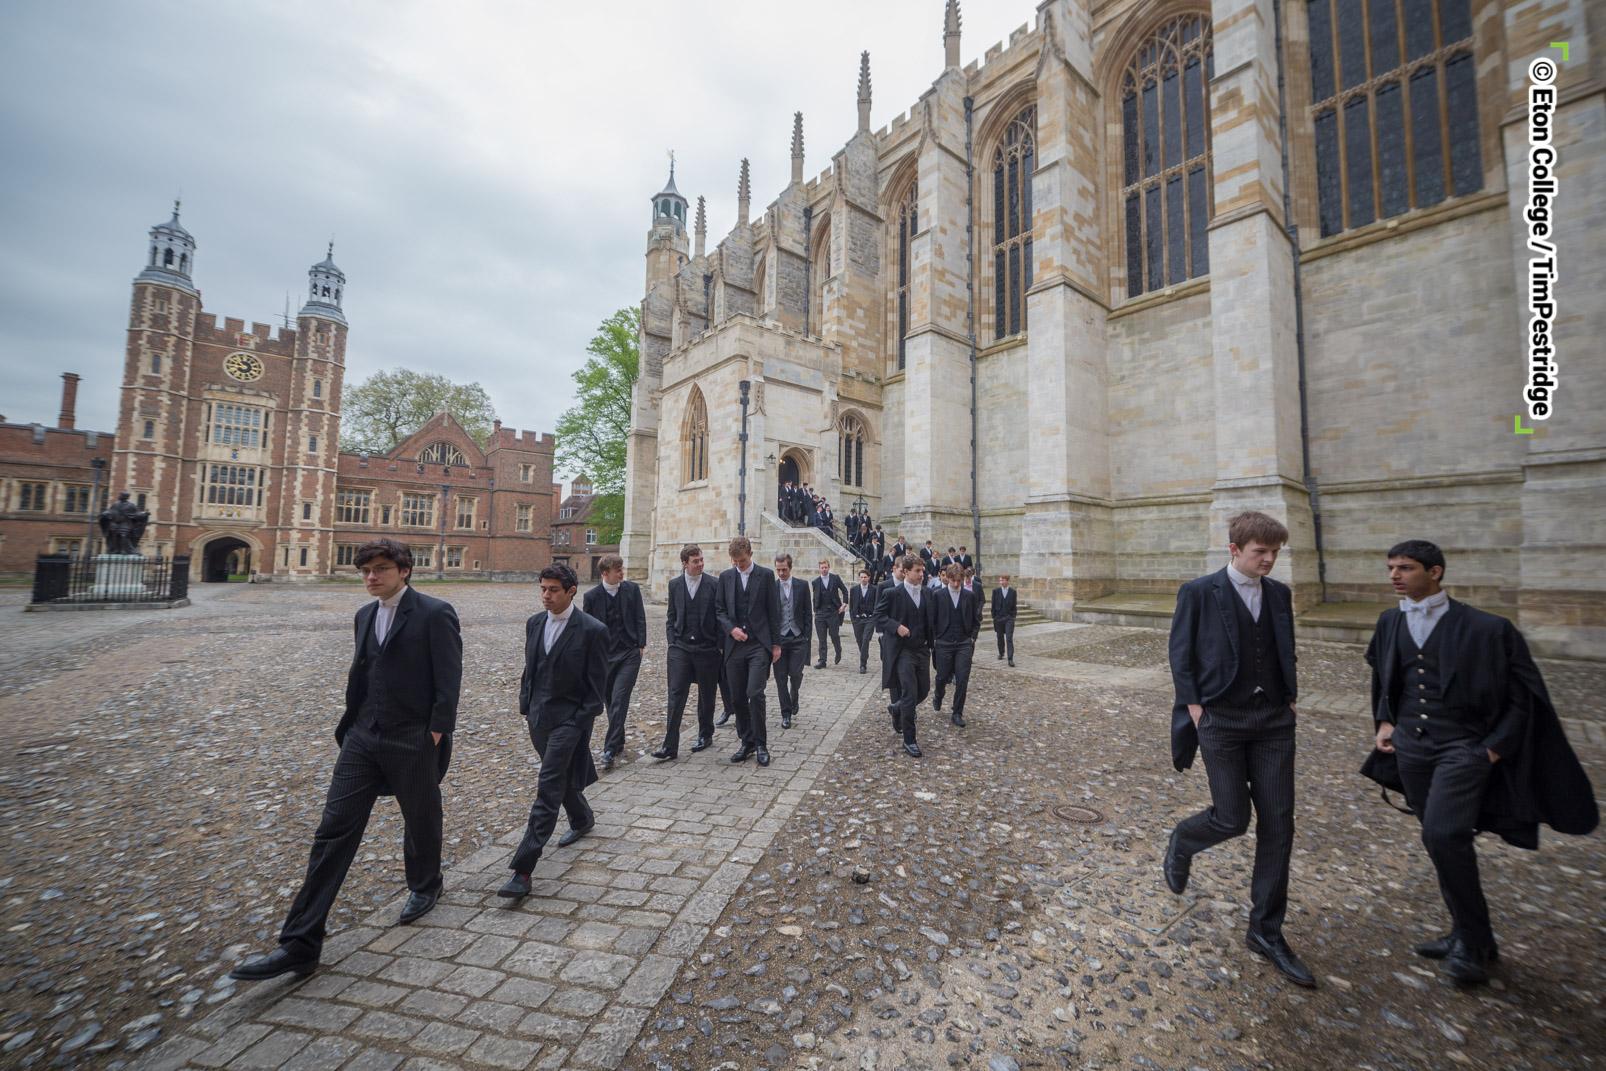 Photos for Eton College Boys School England